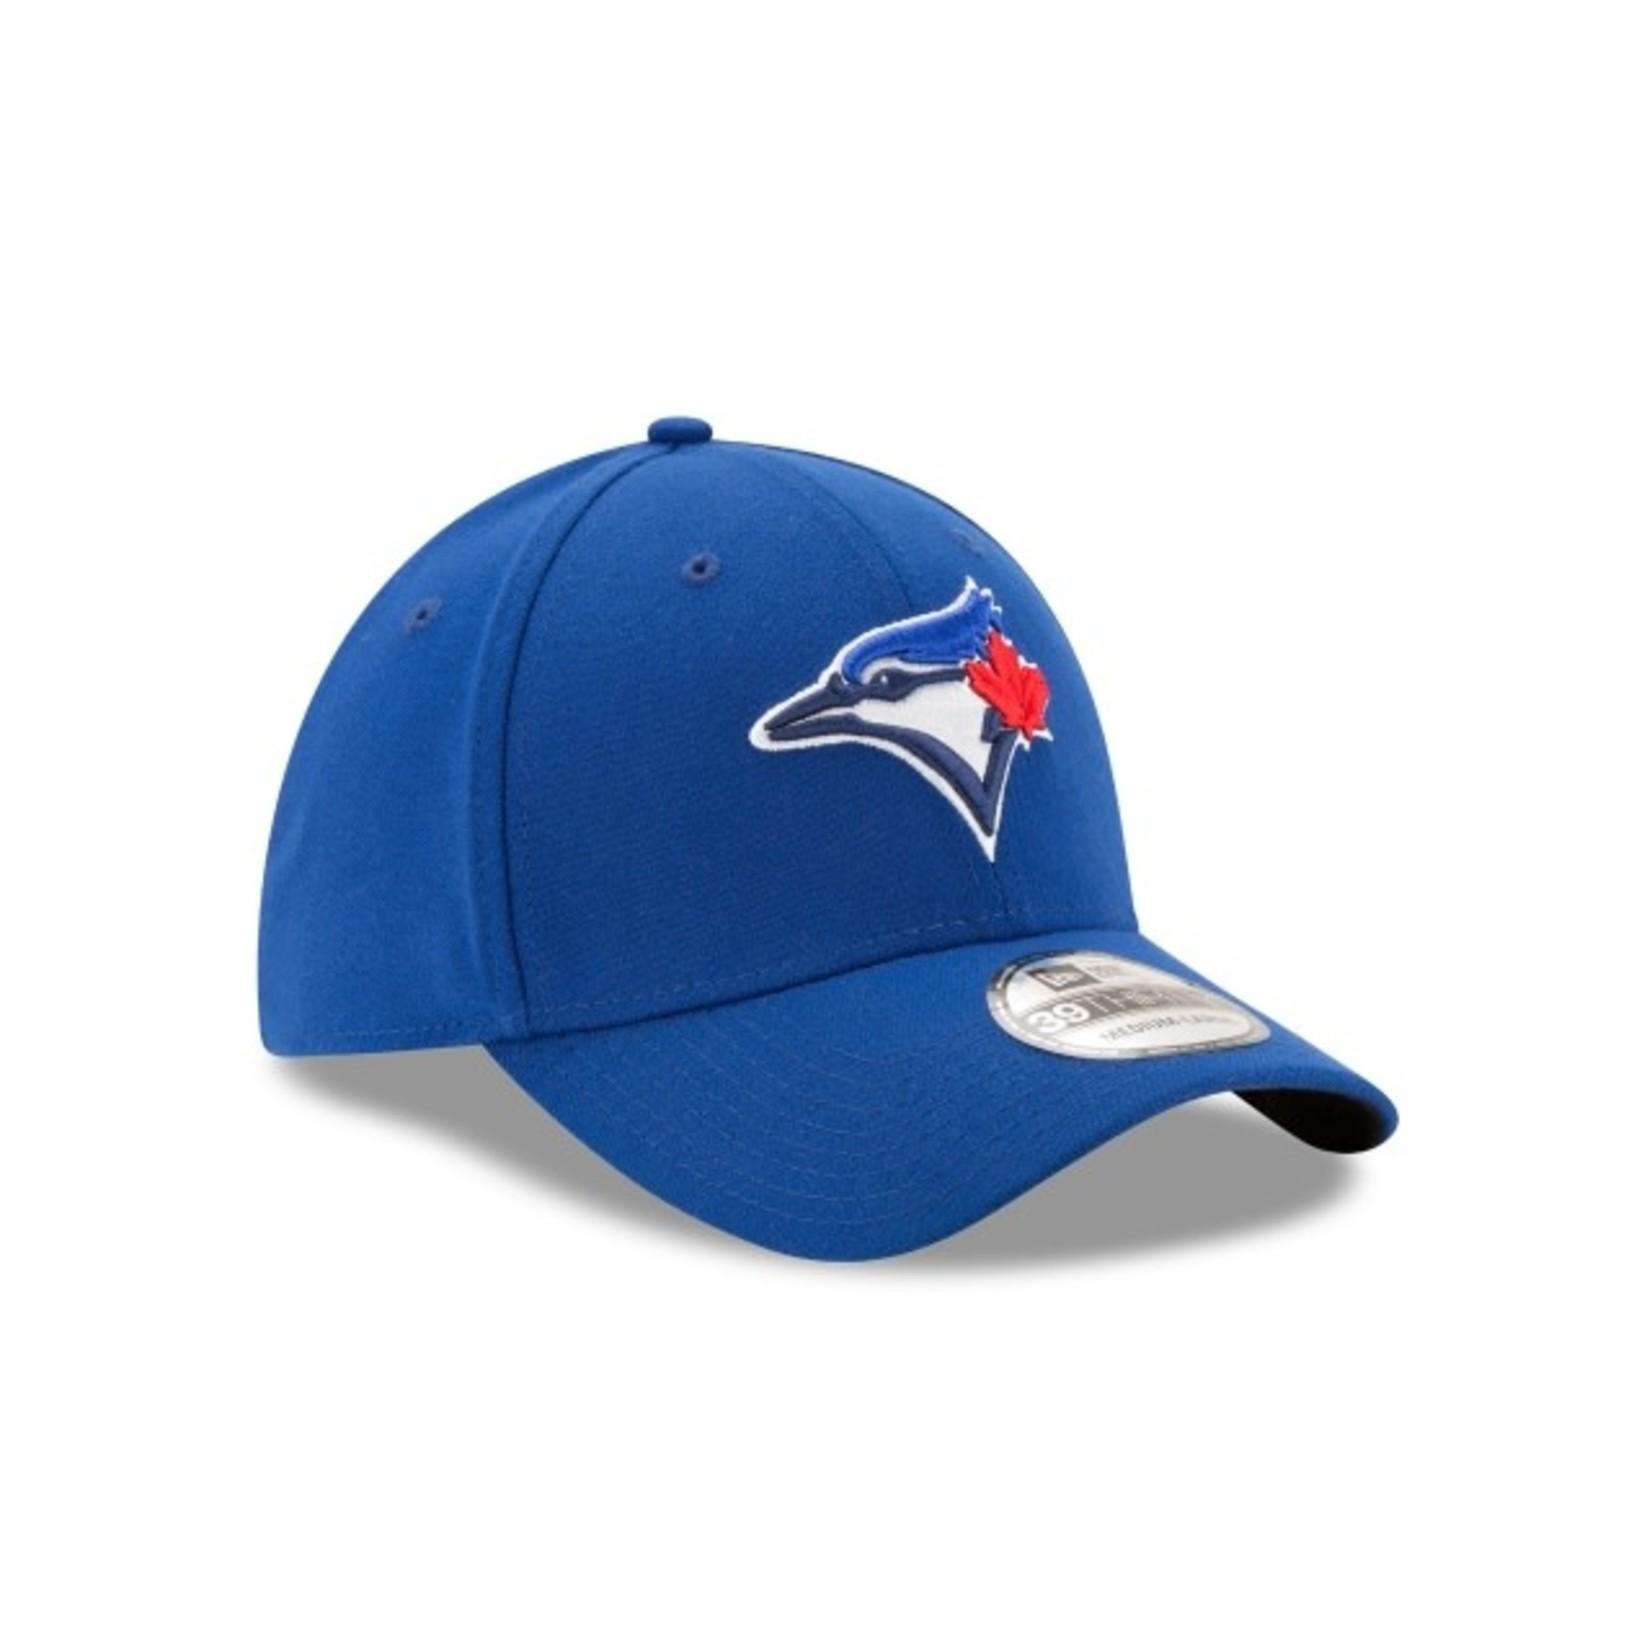 New Era New Era Hat, Team Classic 3930, MLB, Toronto Blue Jays